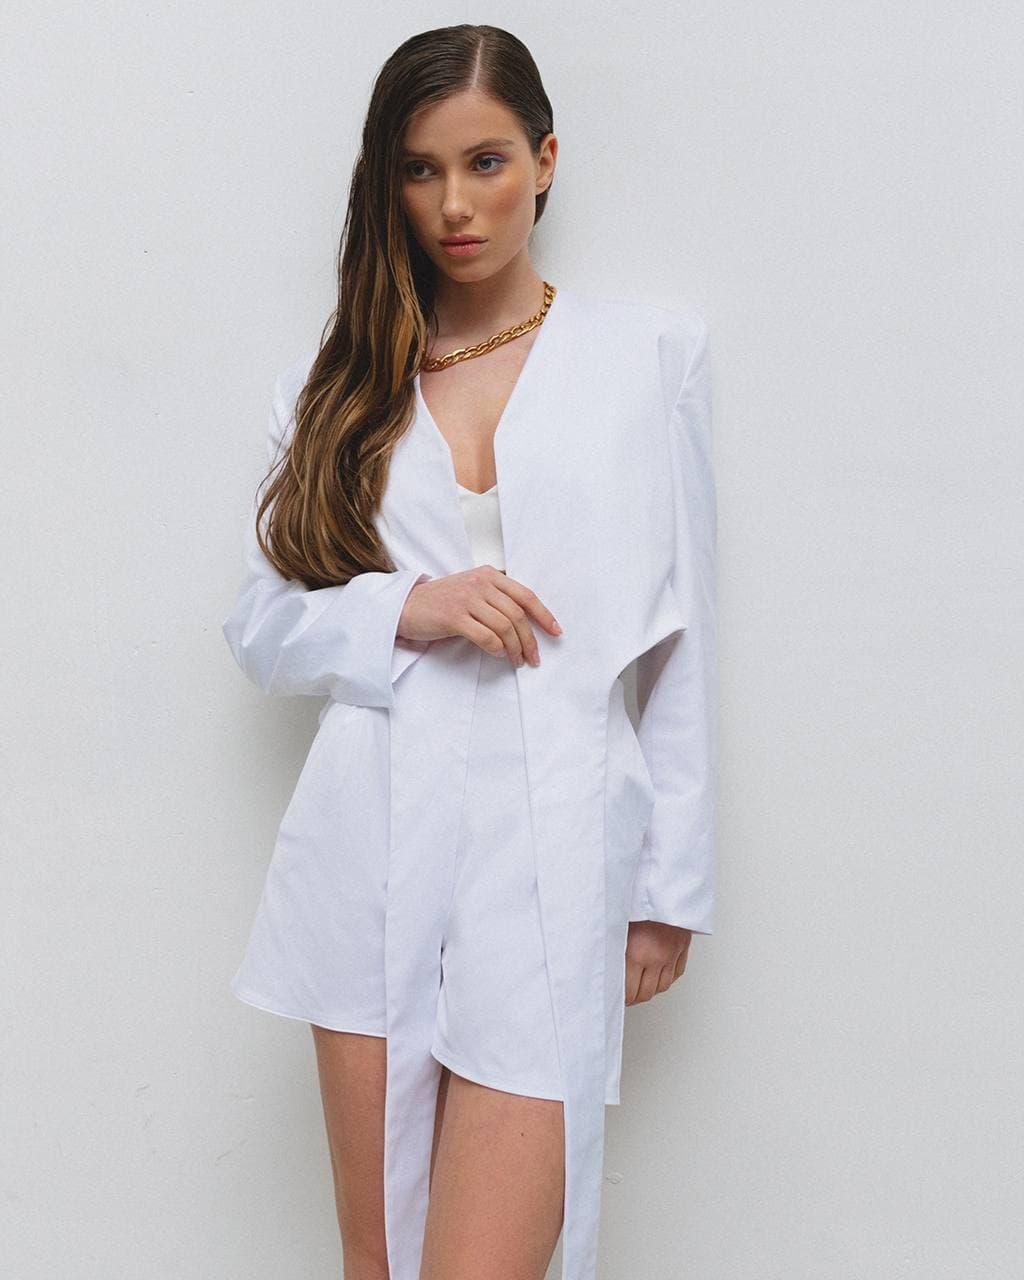 Костюм женский летний (пиджак, шорты) AniTi 629, молочный